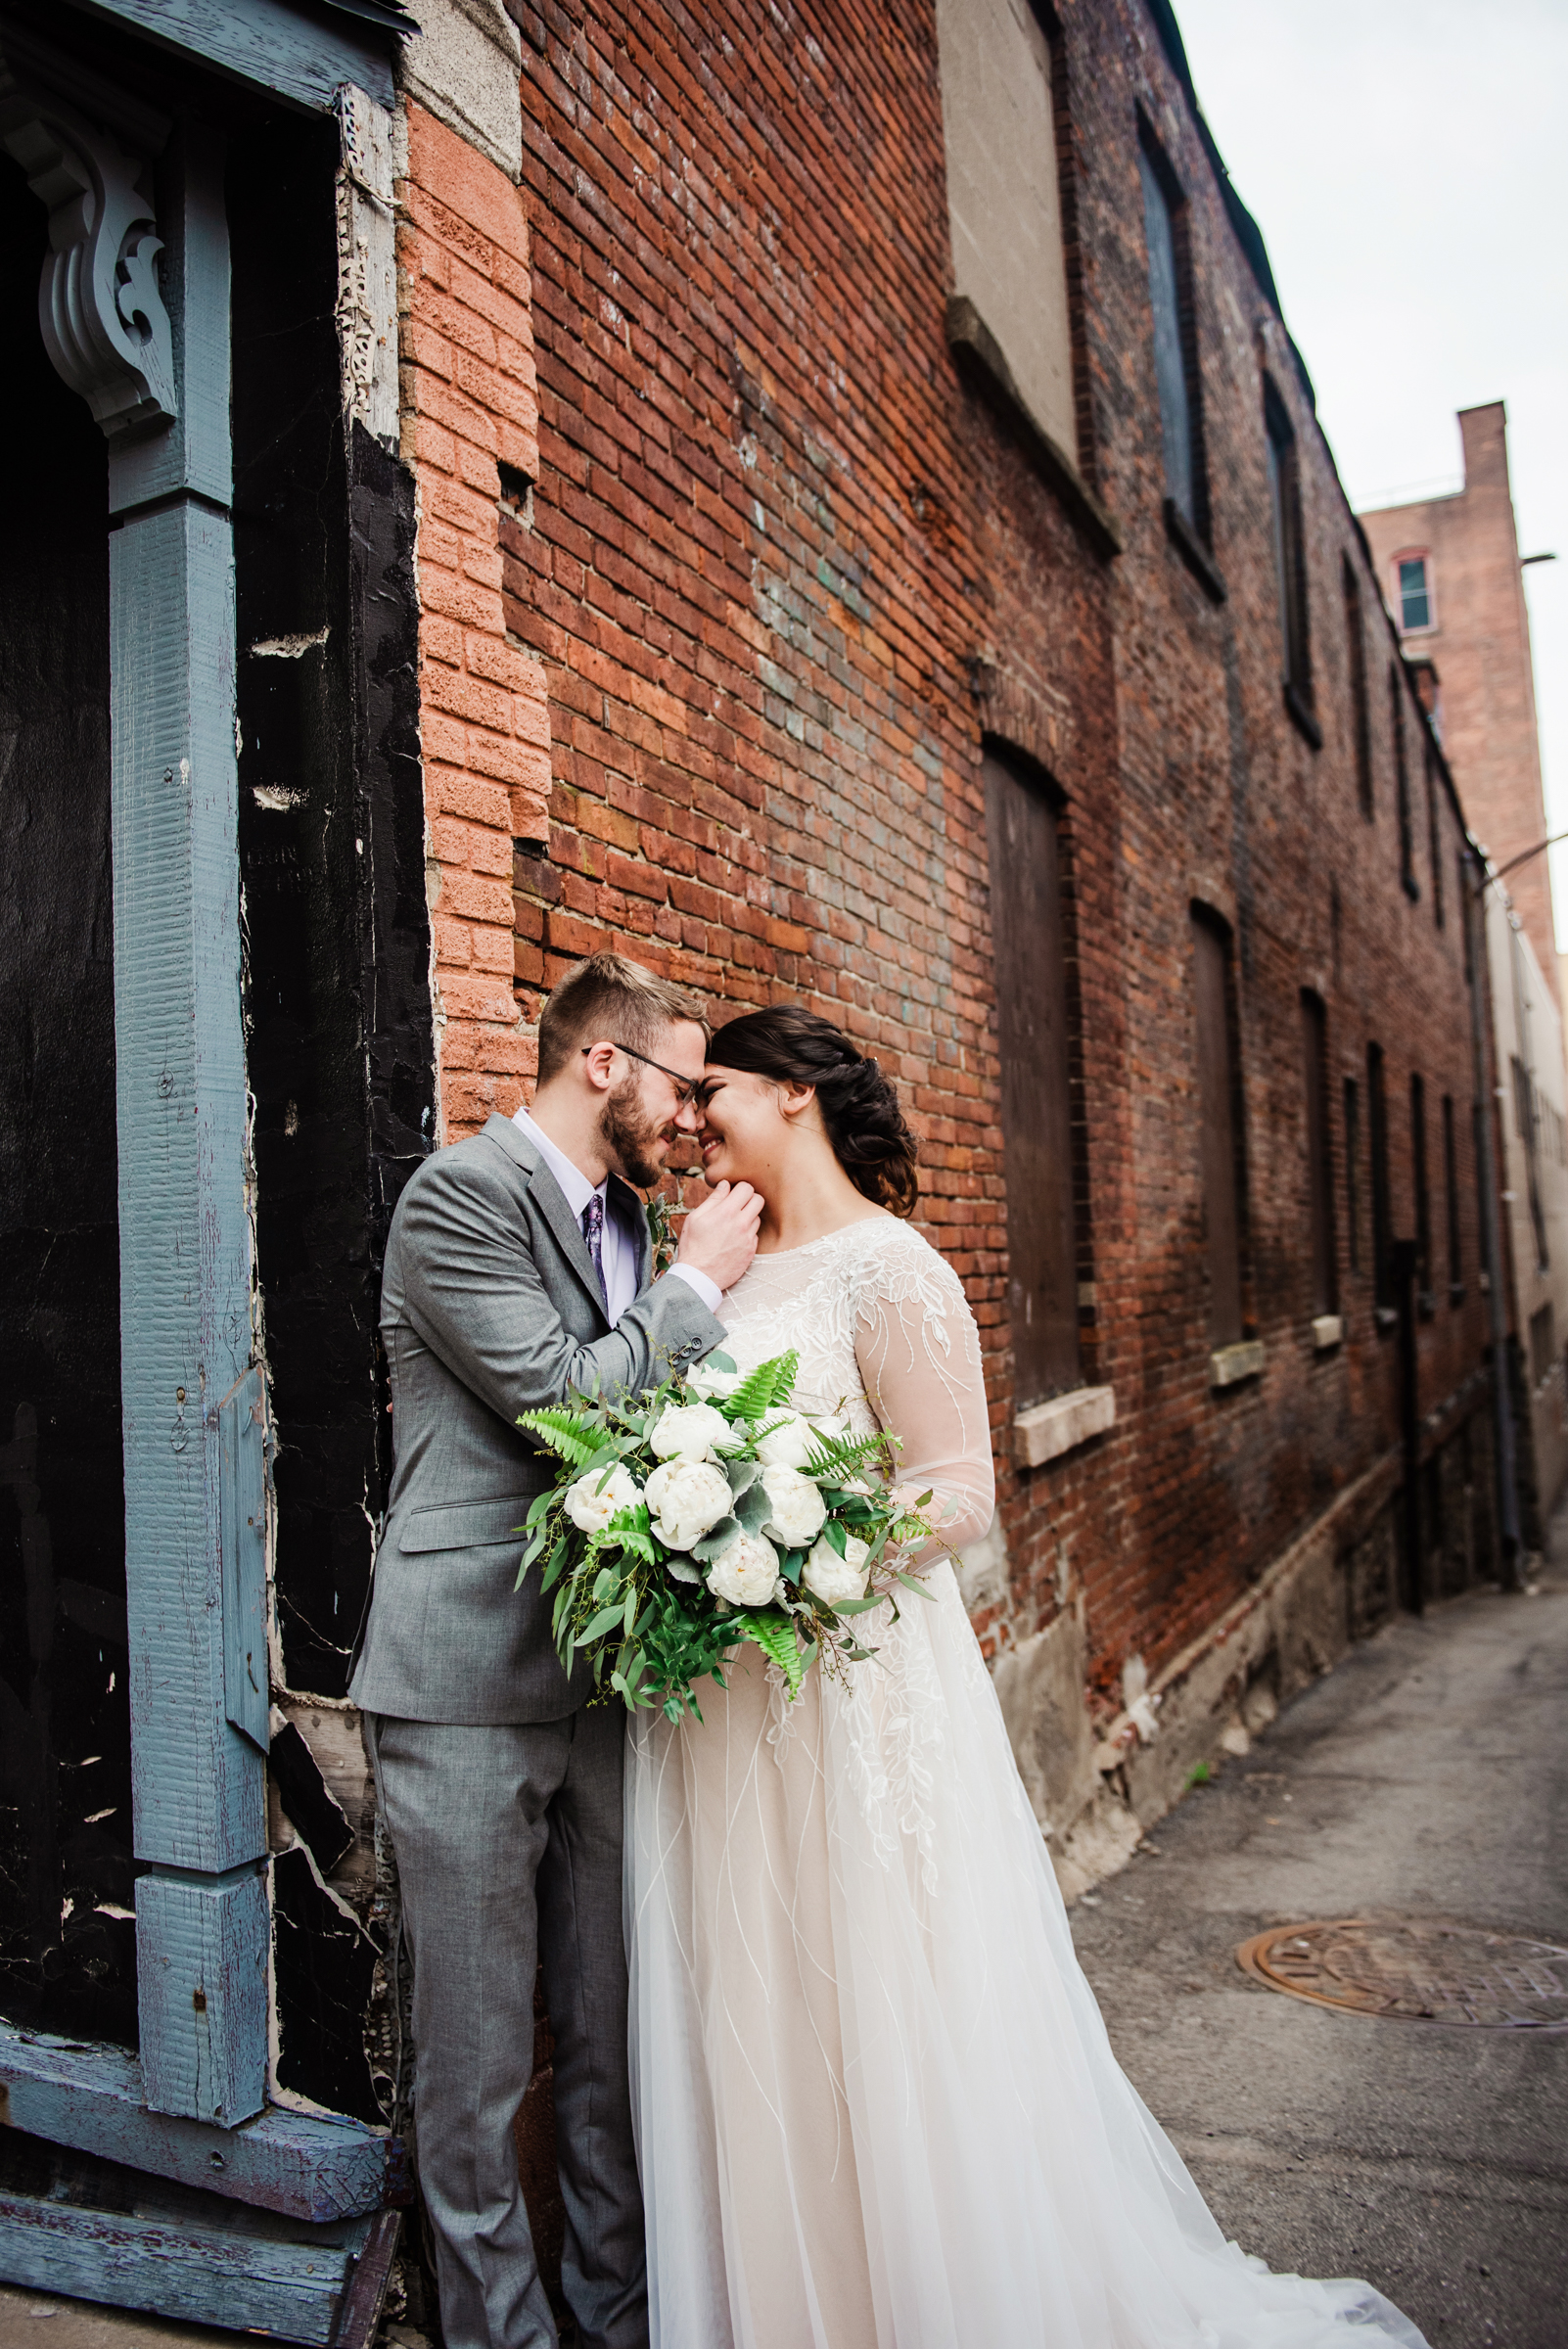 Studio_180_Lamberton_Conservatory_Rochester_Wedding_JILL_STUDIO_Rochester_NY_Photographer_DSC_9040.jpg